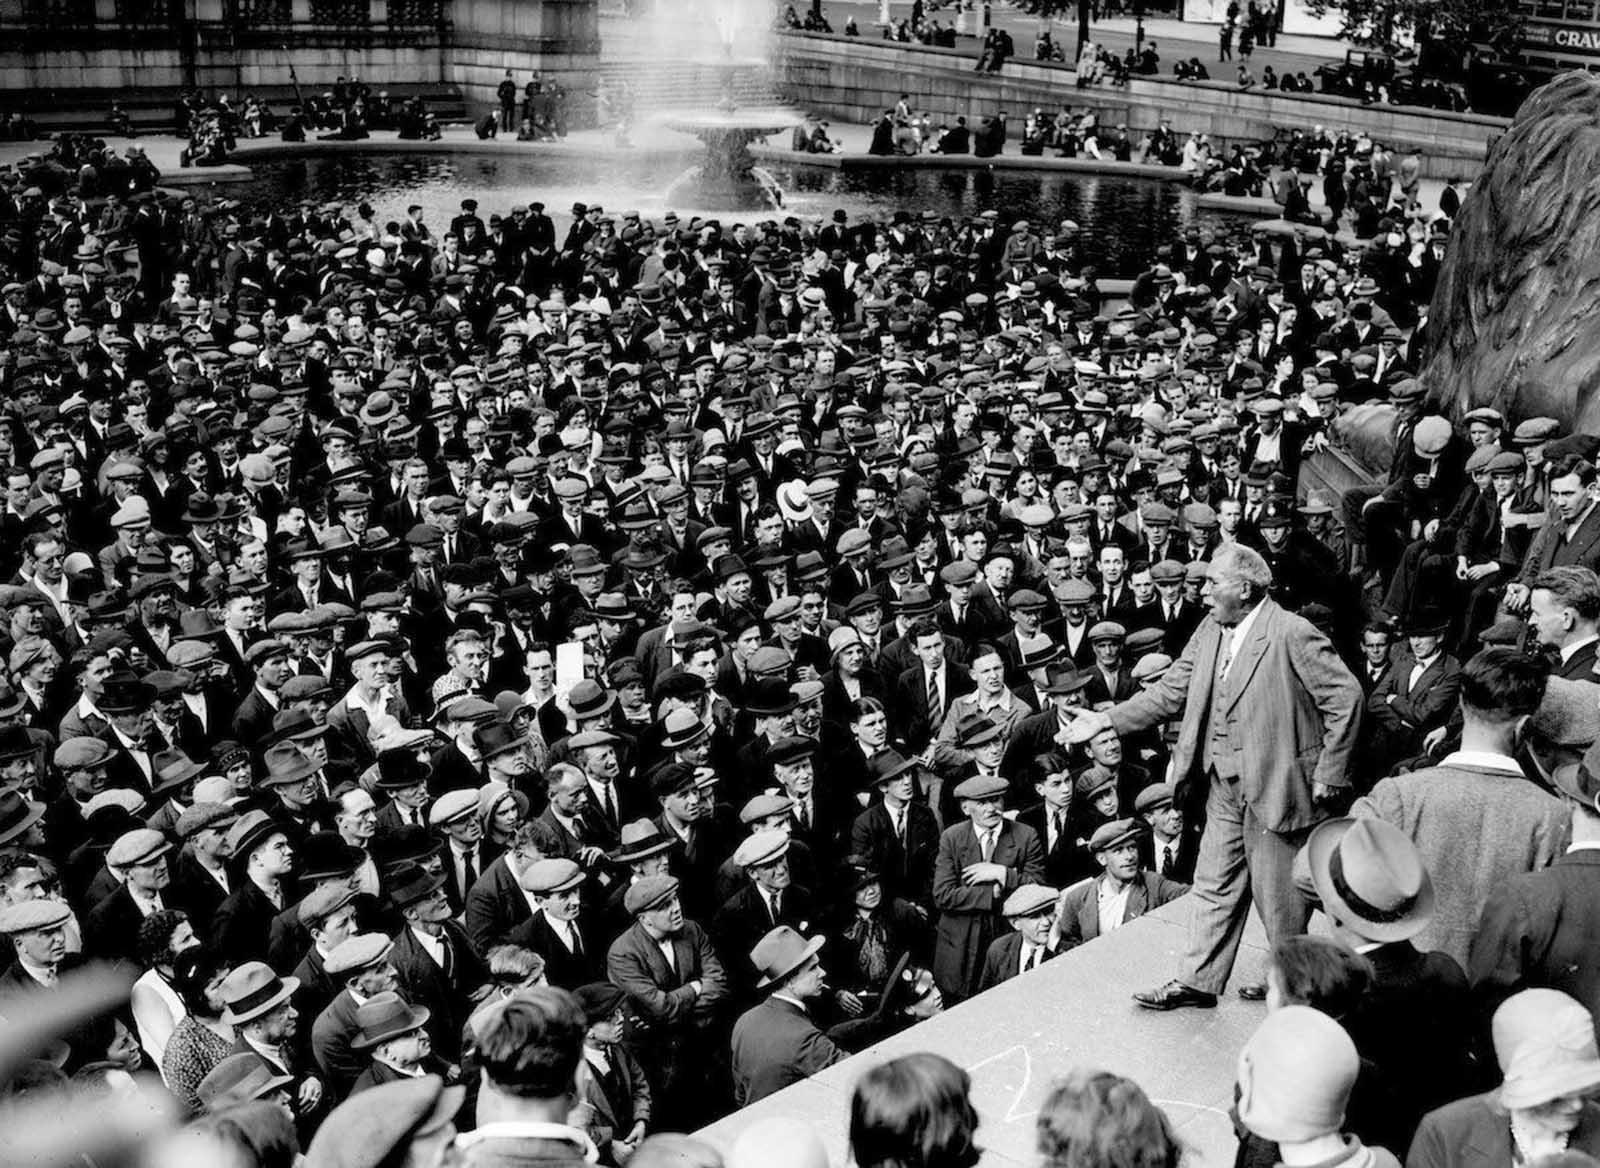 Veteran Trade Unionist Tom Mann (1856-1941) addressing a Communist meeting in Trafalgar Square, London. 1931.